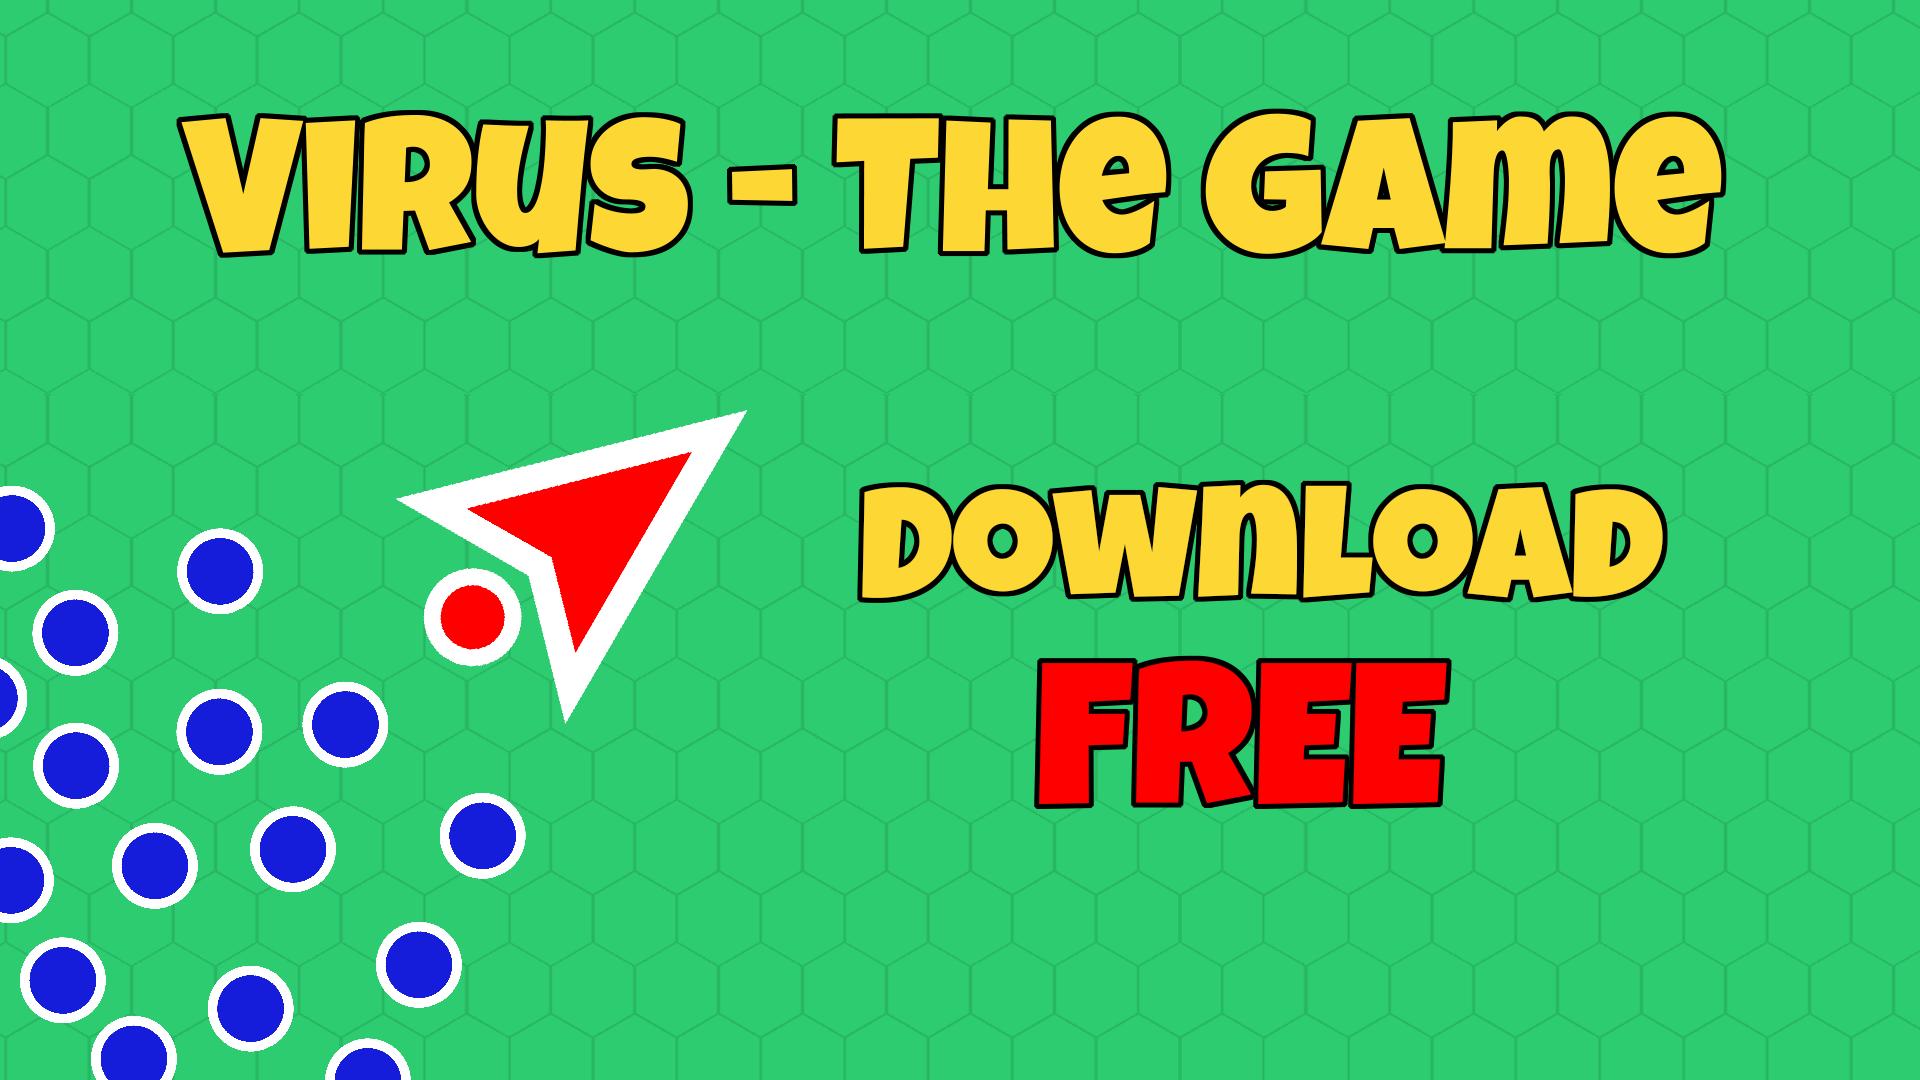 Virus - The Game